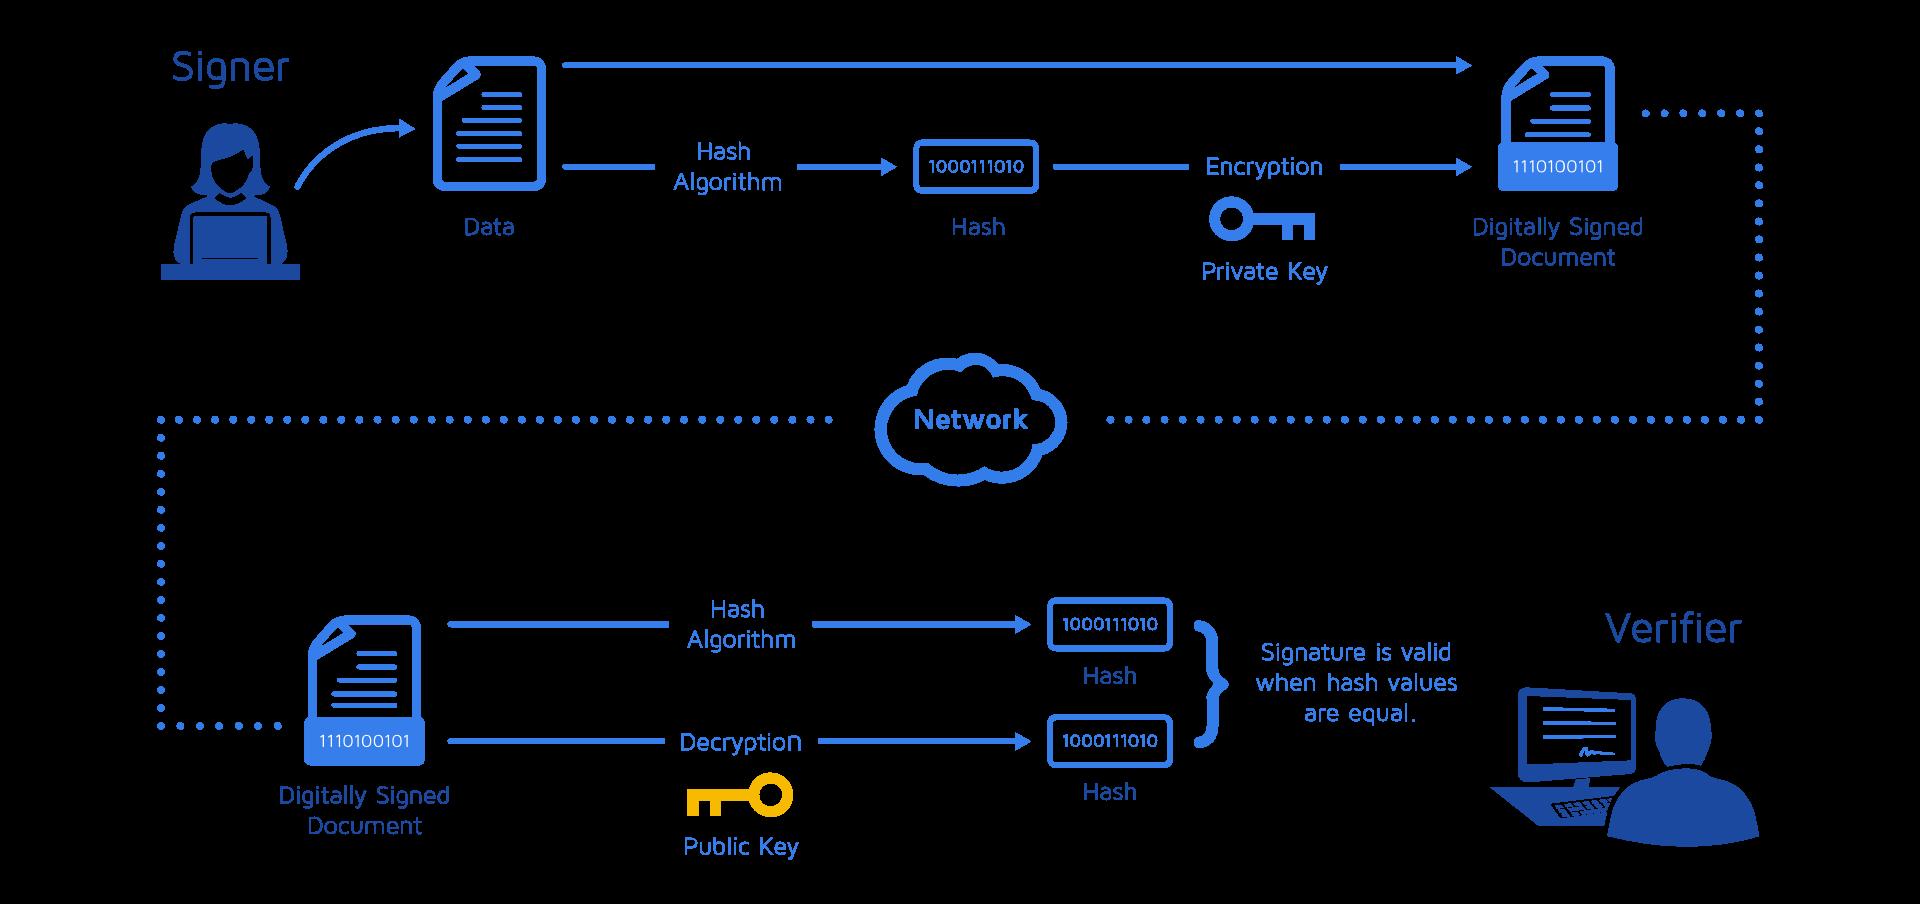 SAP Signature Management by DocuSign   dataworld